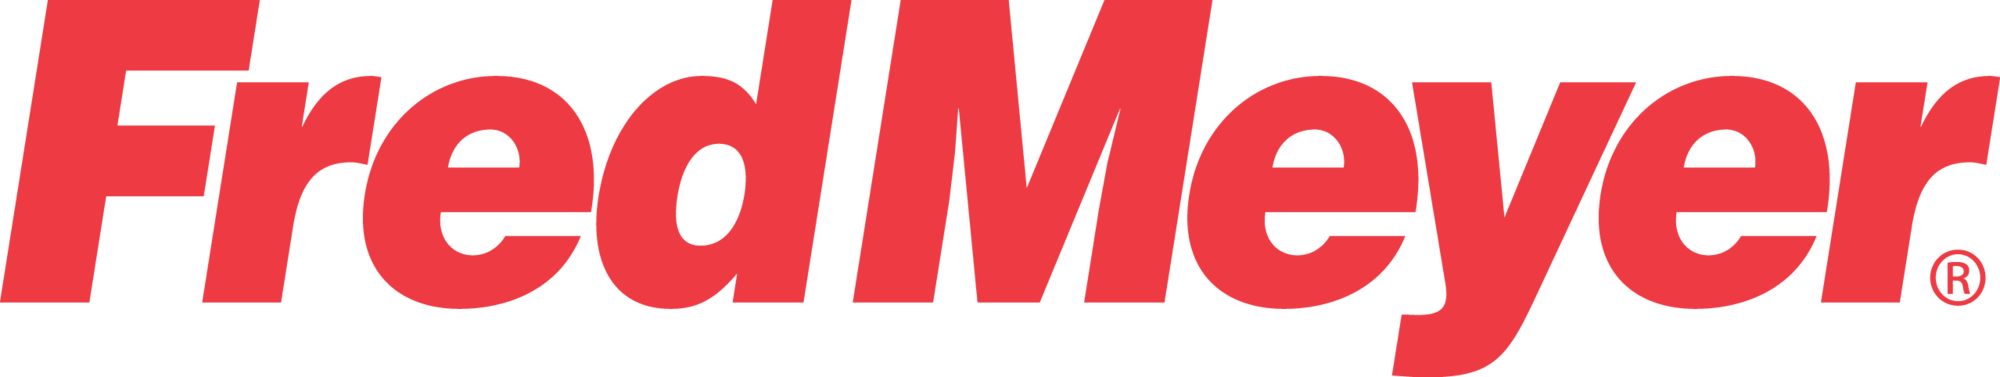 Fred_Meyer_logo.png